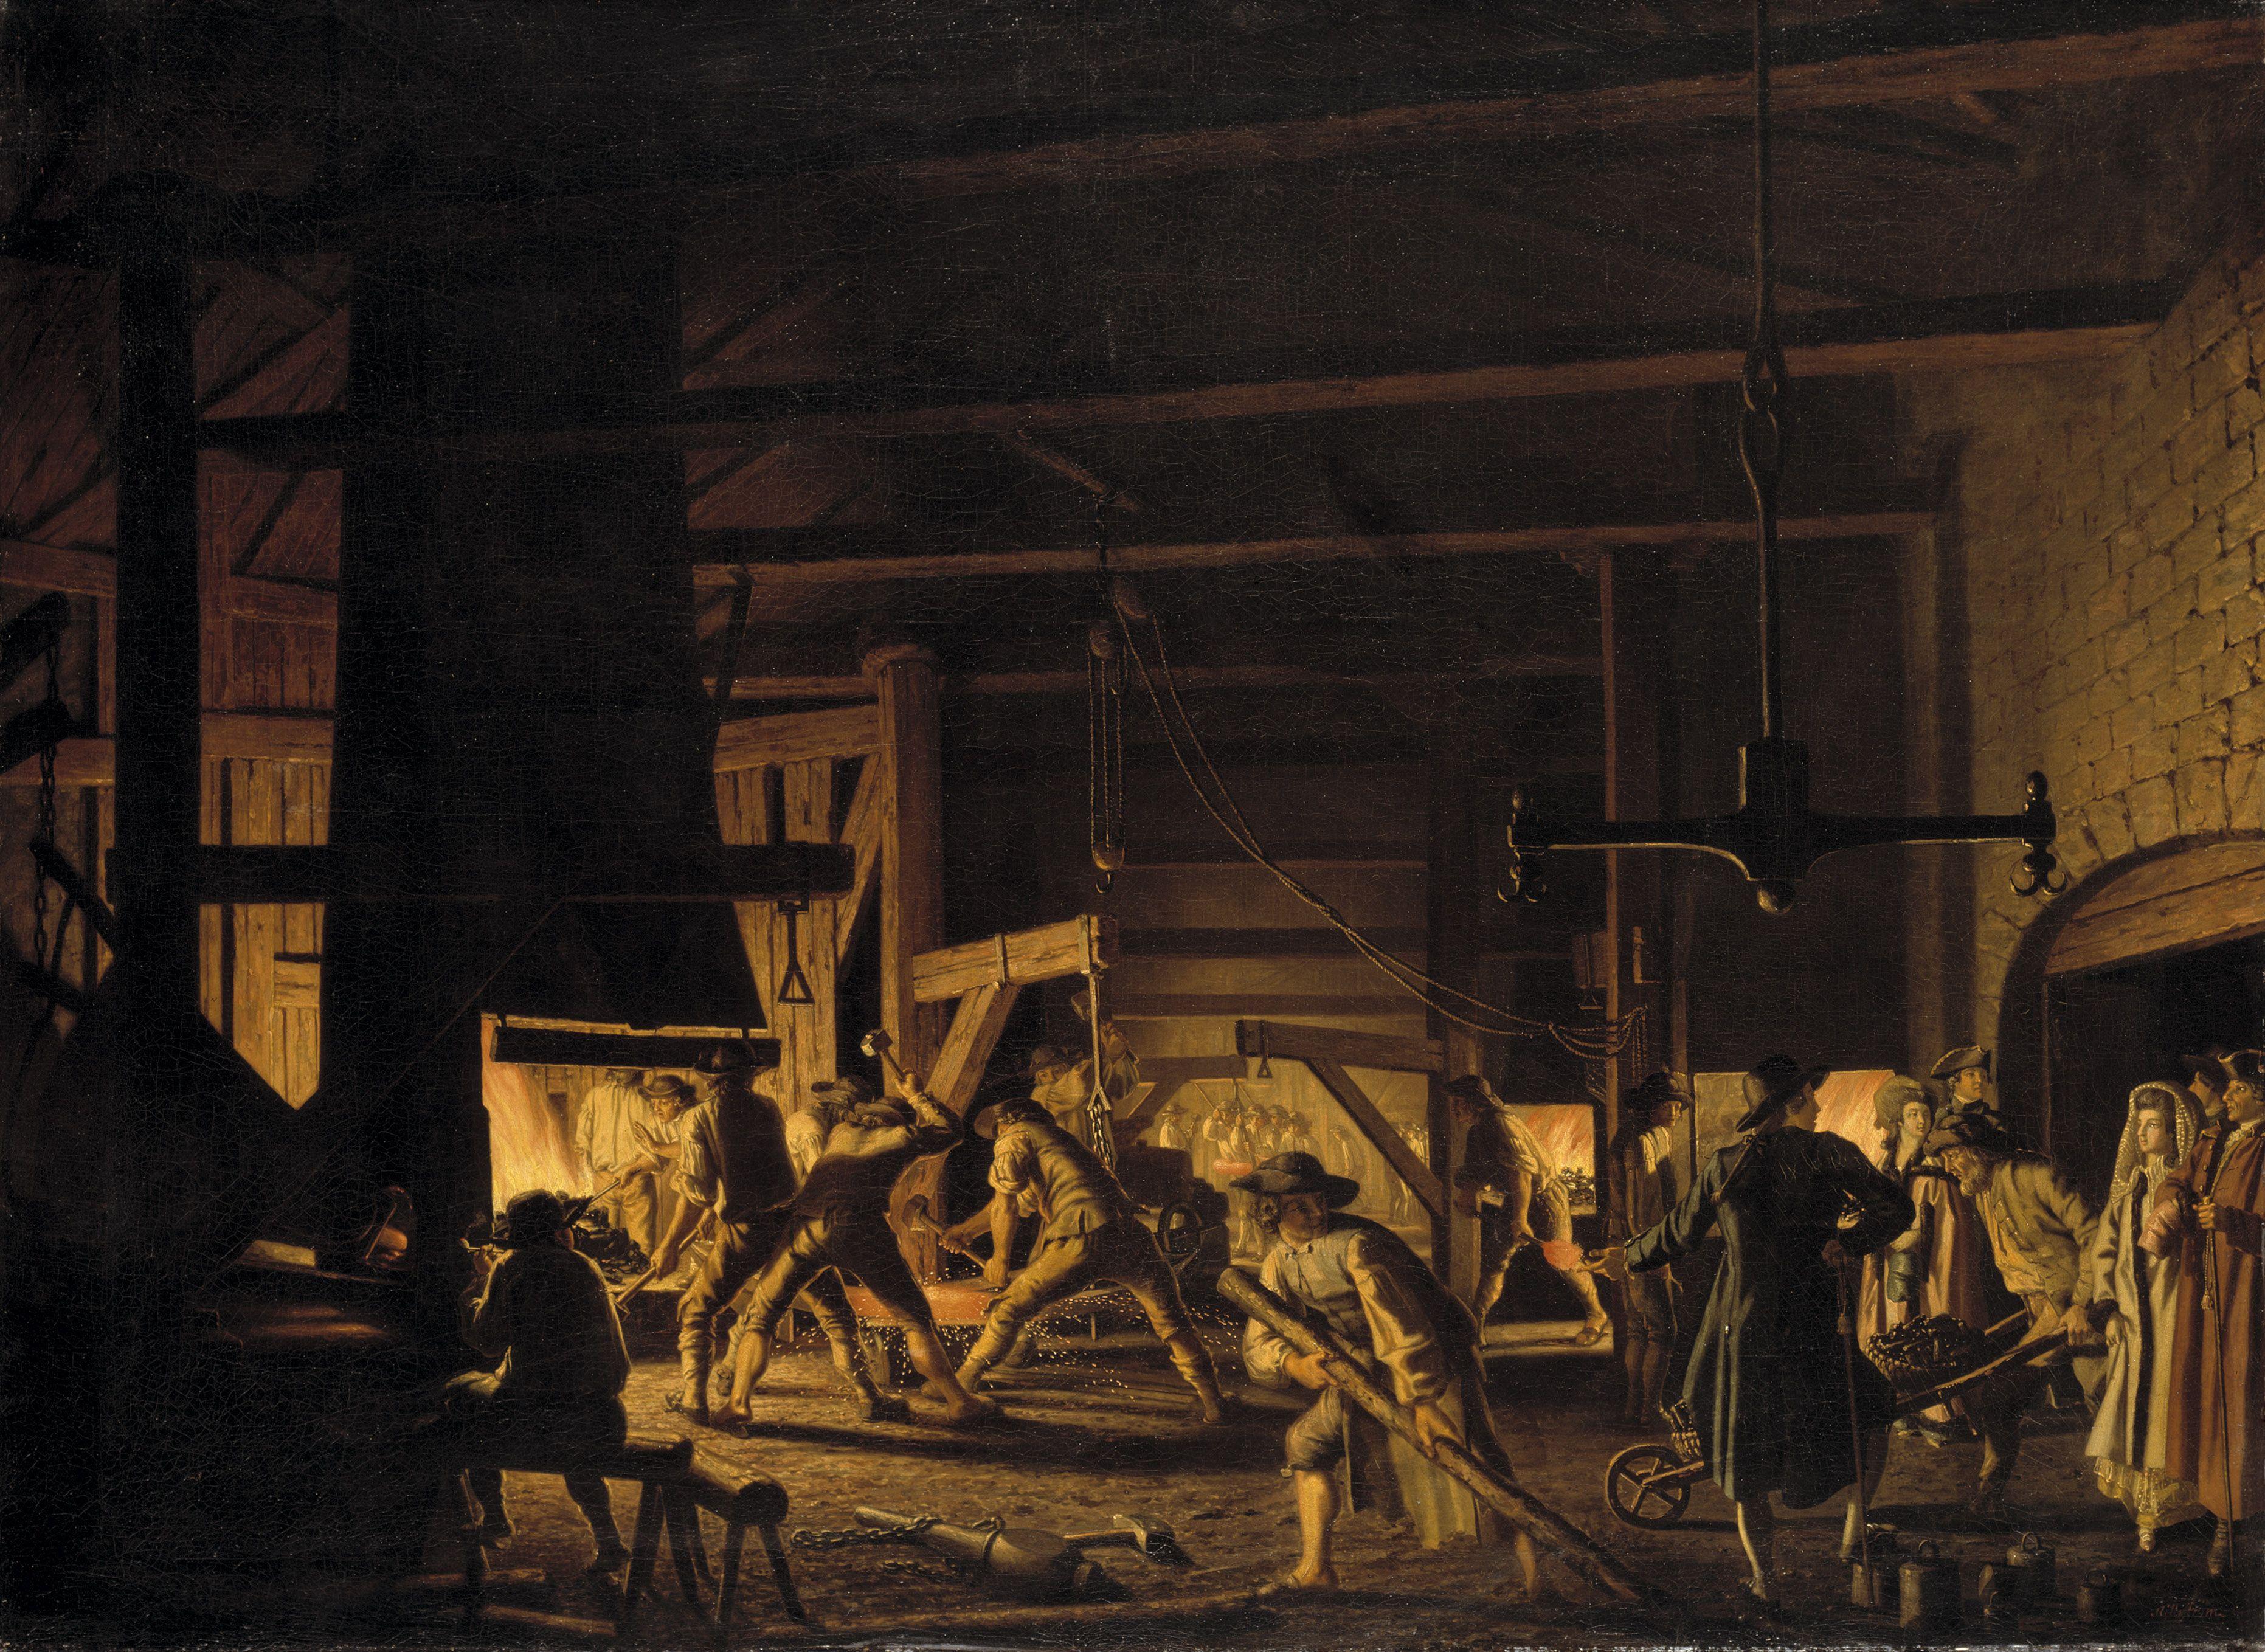 Besök i Söderfors ankarsmedja, Smederna i fullt arbete, 1782, olja på duk, 137 x 185 cm